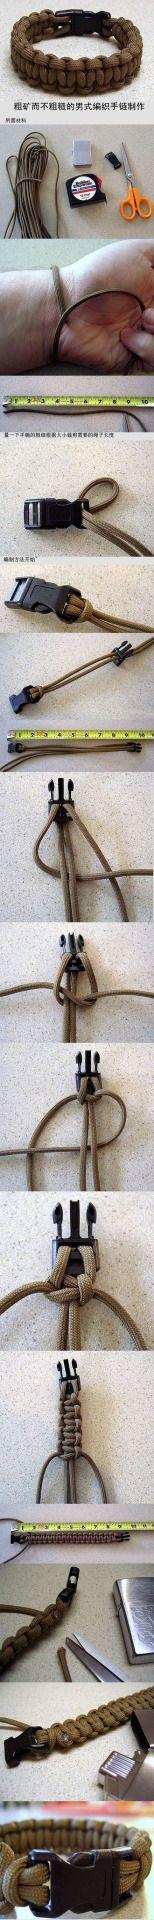 Tendance Bracelets  粗狂而不粗_来自totogirl的图片分享-堆糖网  Tendance & idée Bracelets 2016/2017 Description d9527b3057df8a0d324468ede1c28ff6.jpg (4405494)